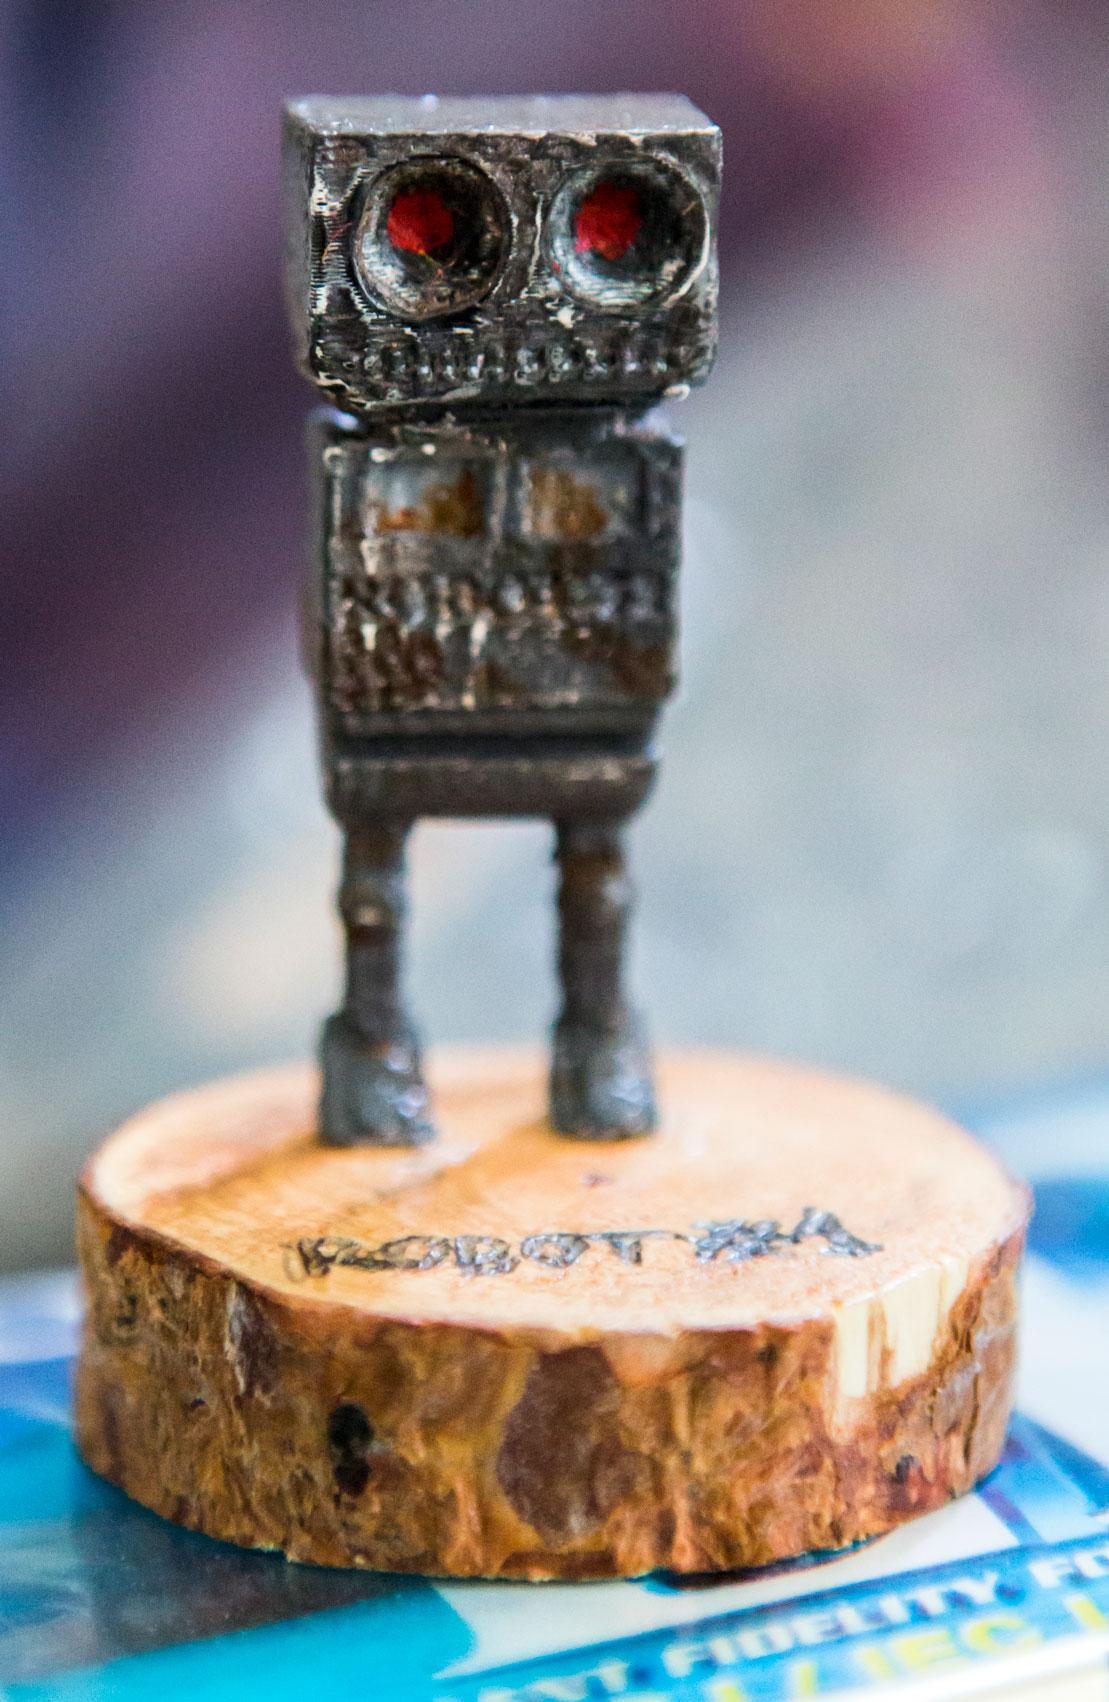 Robot #1 - Sculpture and 3D print